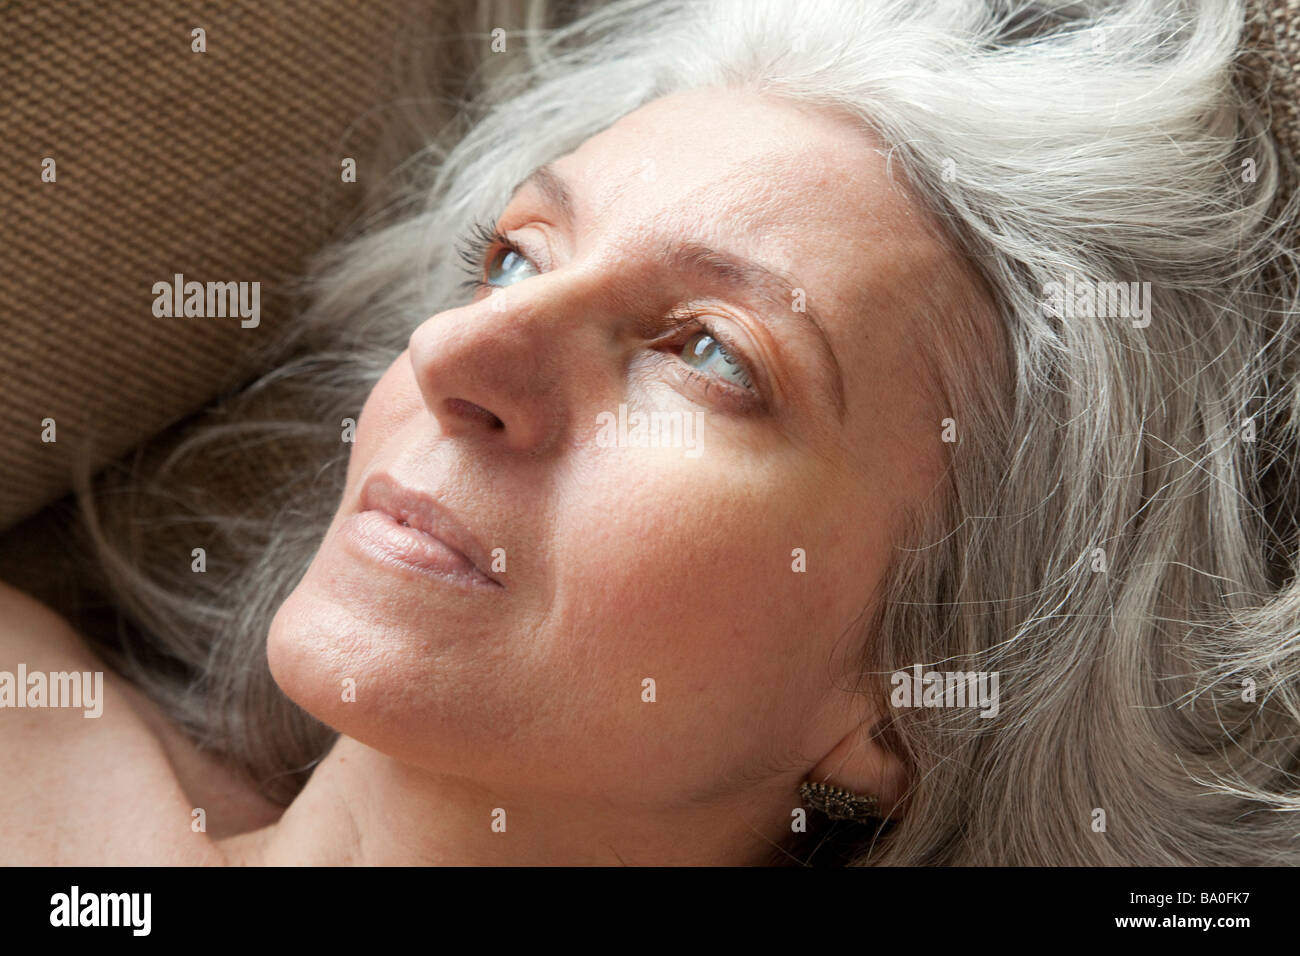 senior woman looking pensive / daydreaming Stock Photo